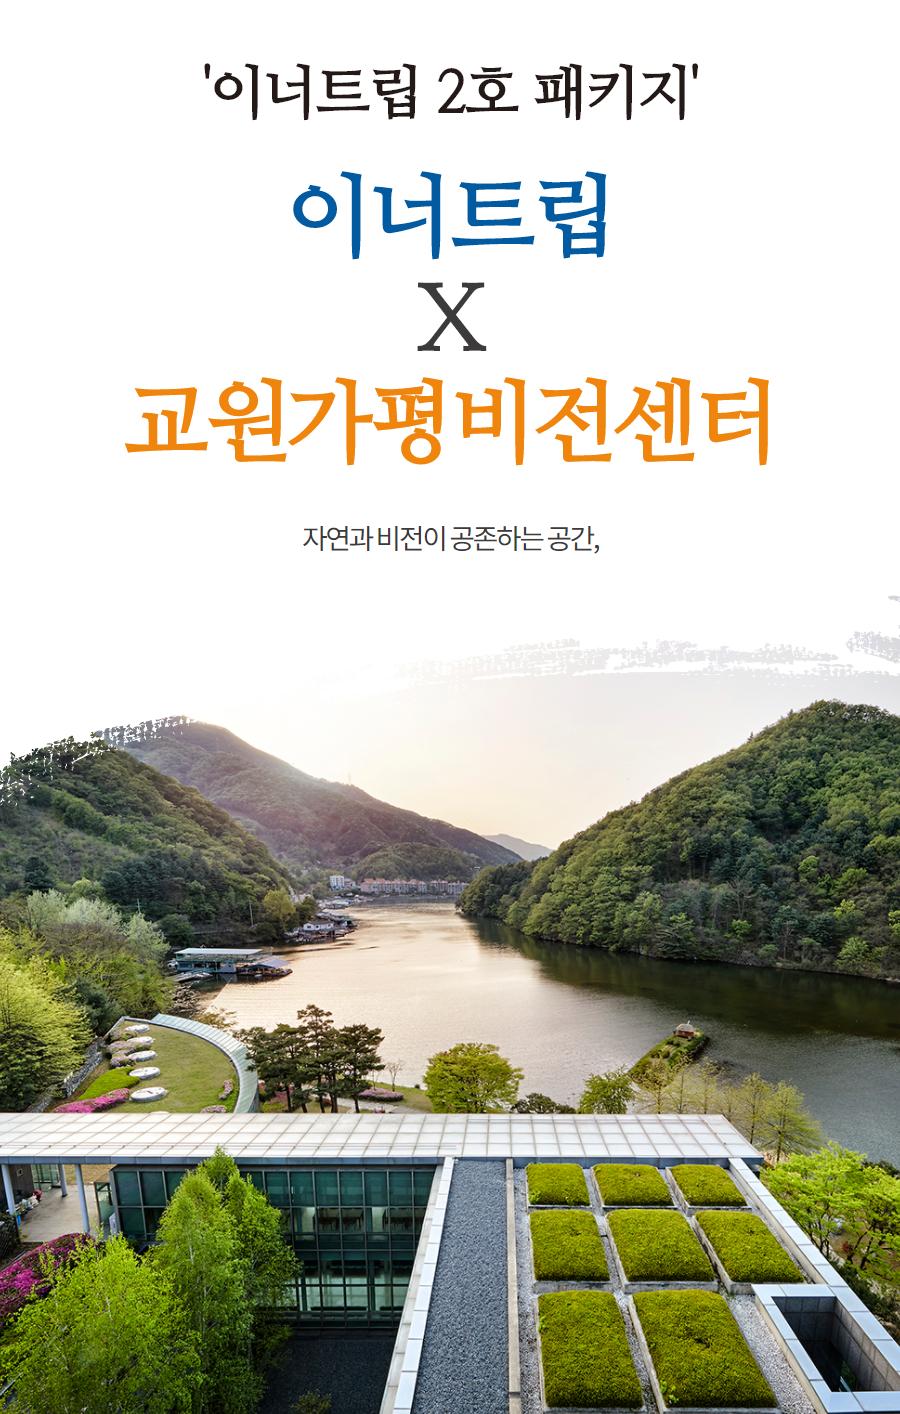 package kyowon 1 | 이너트립